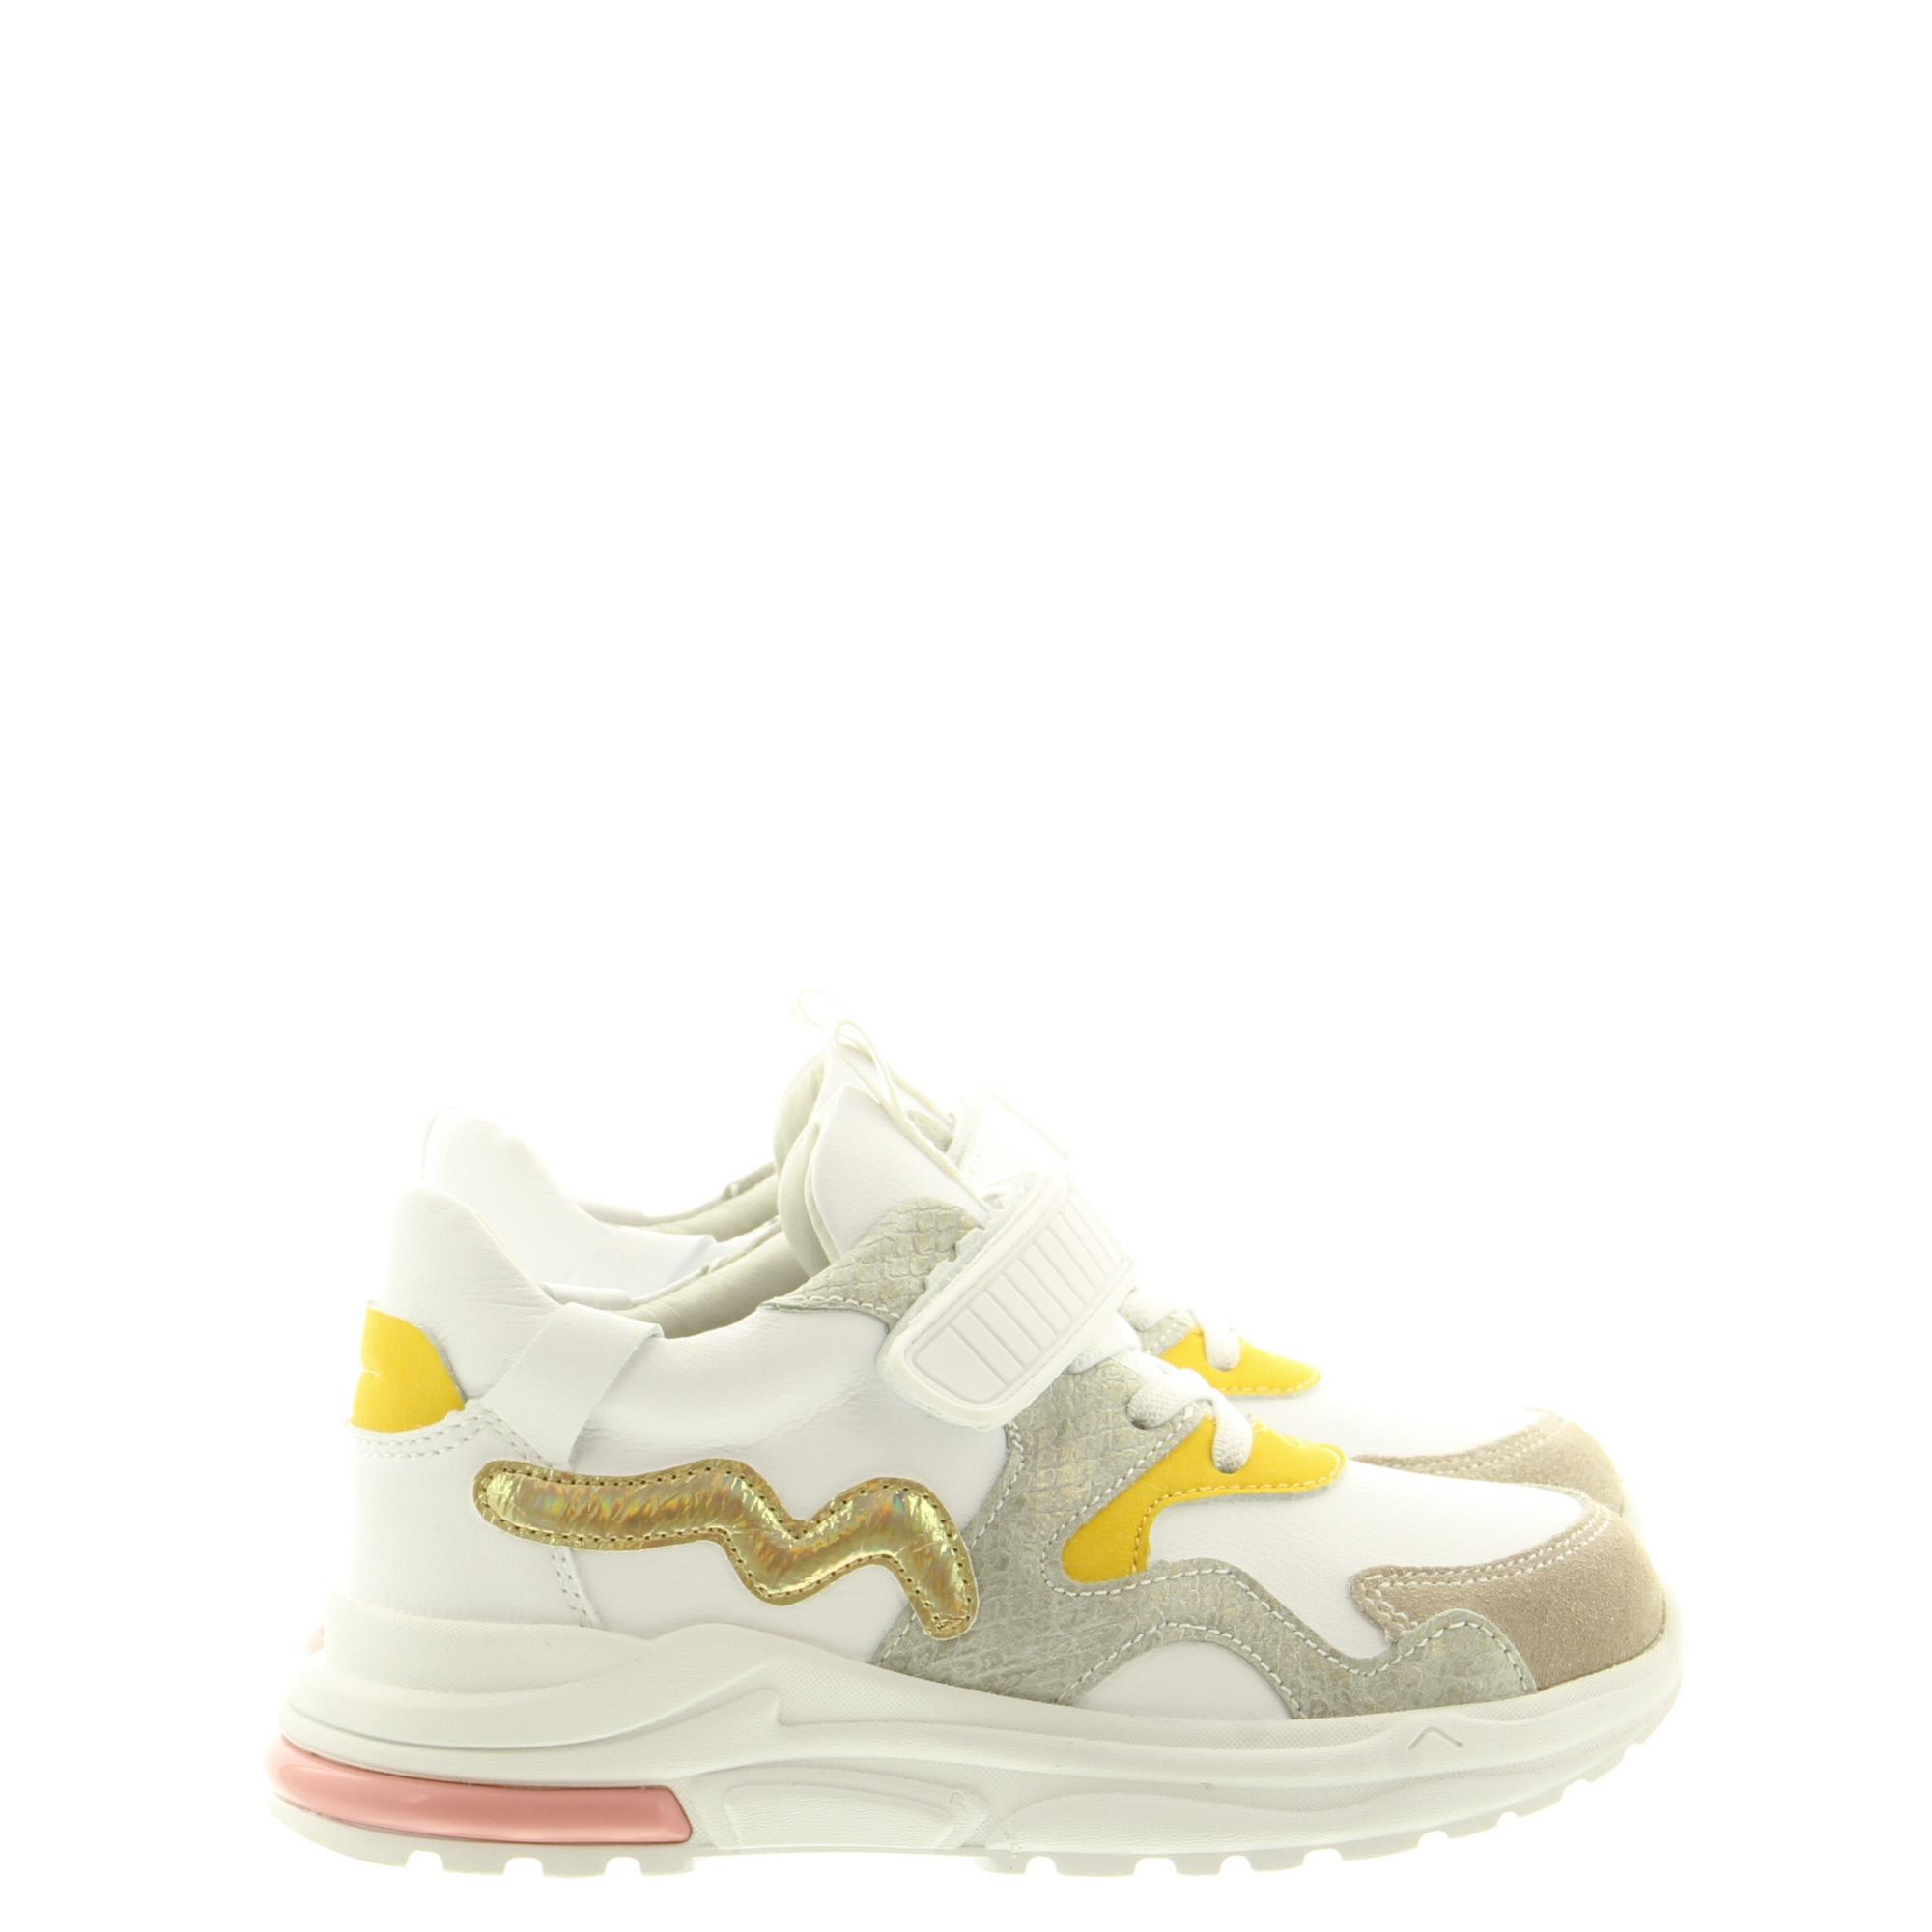 ShoesMe NR21S006-B White Yellow